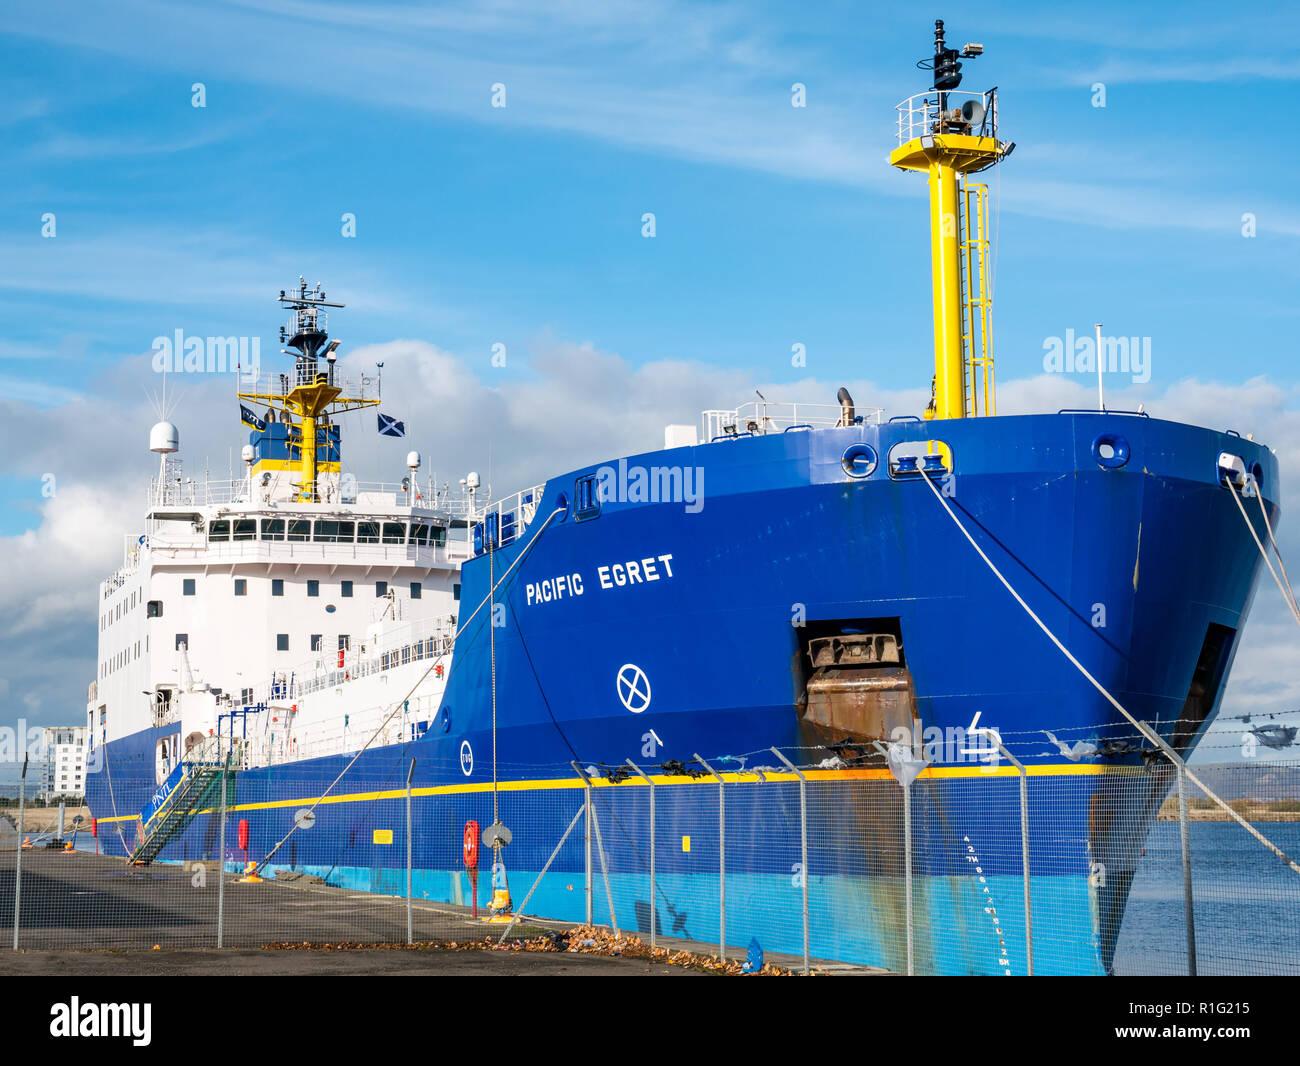 pacific-egret-leith-nucelar-fuel-carrier